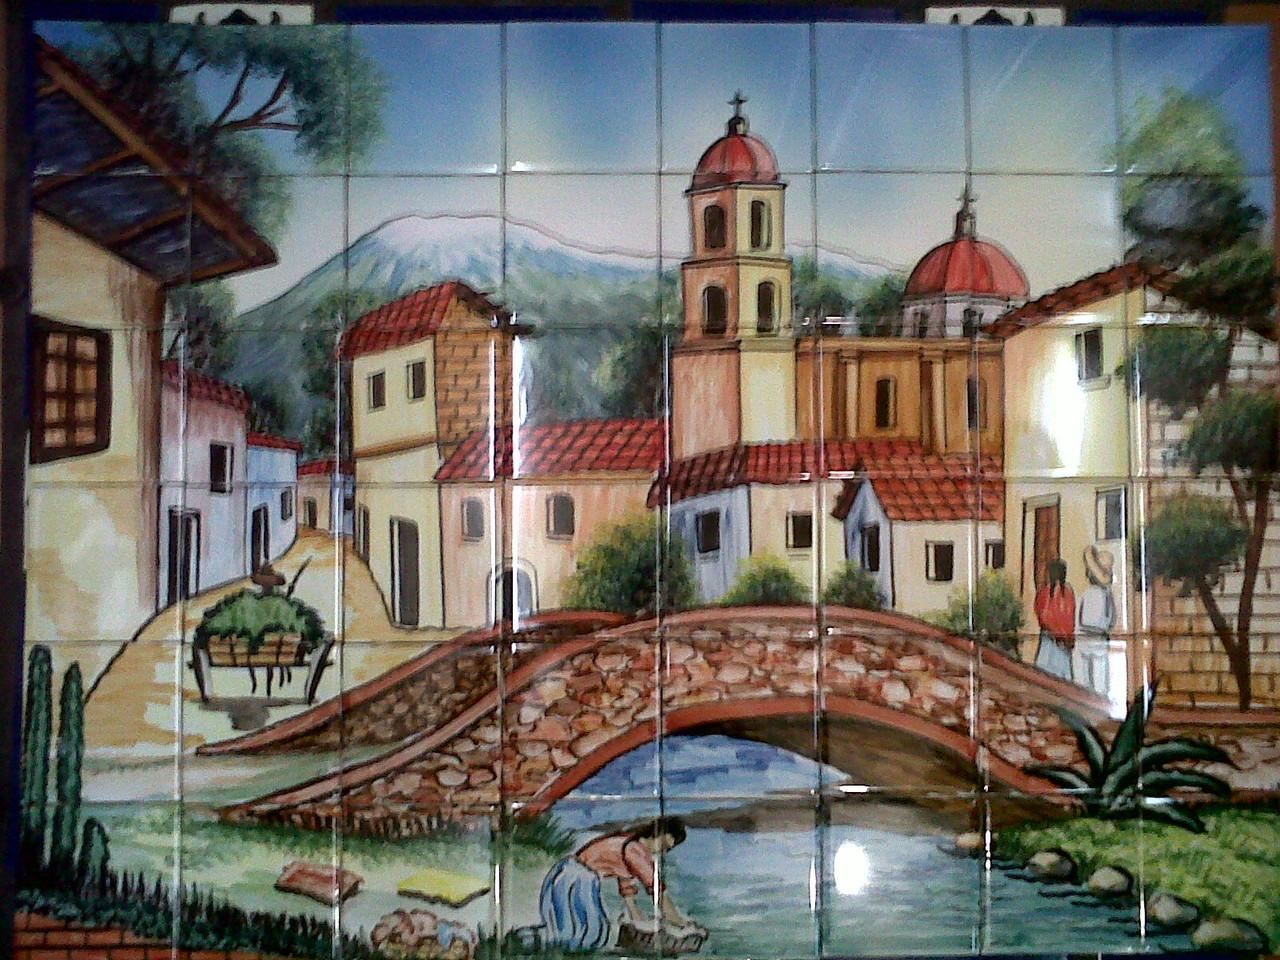 Rincones de México